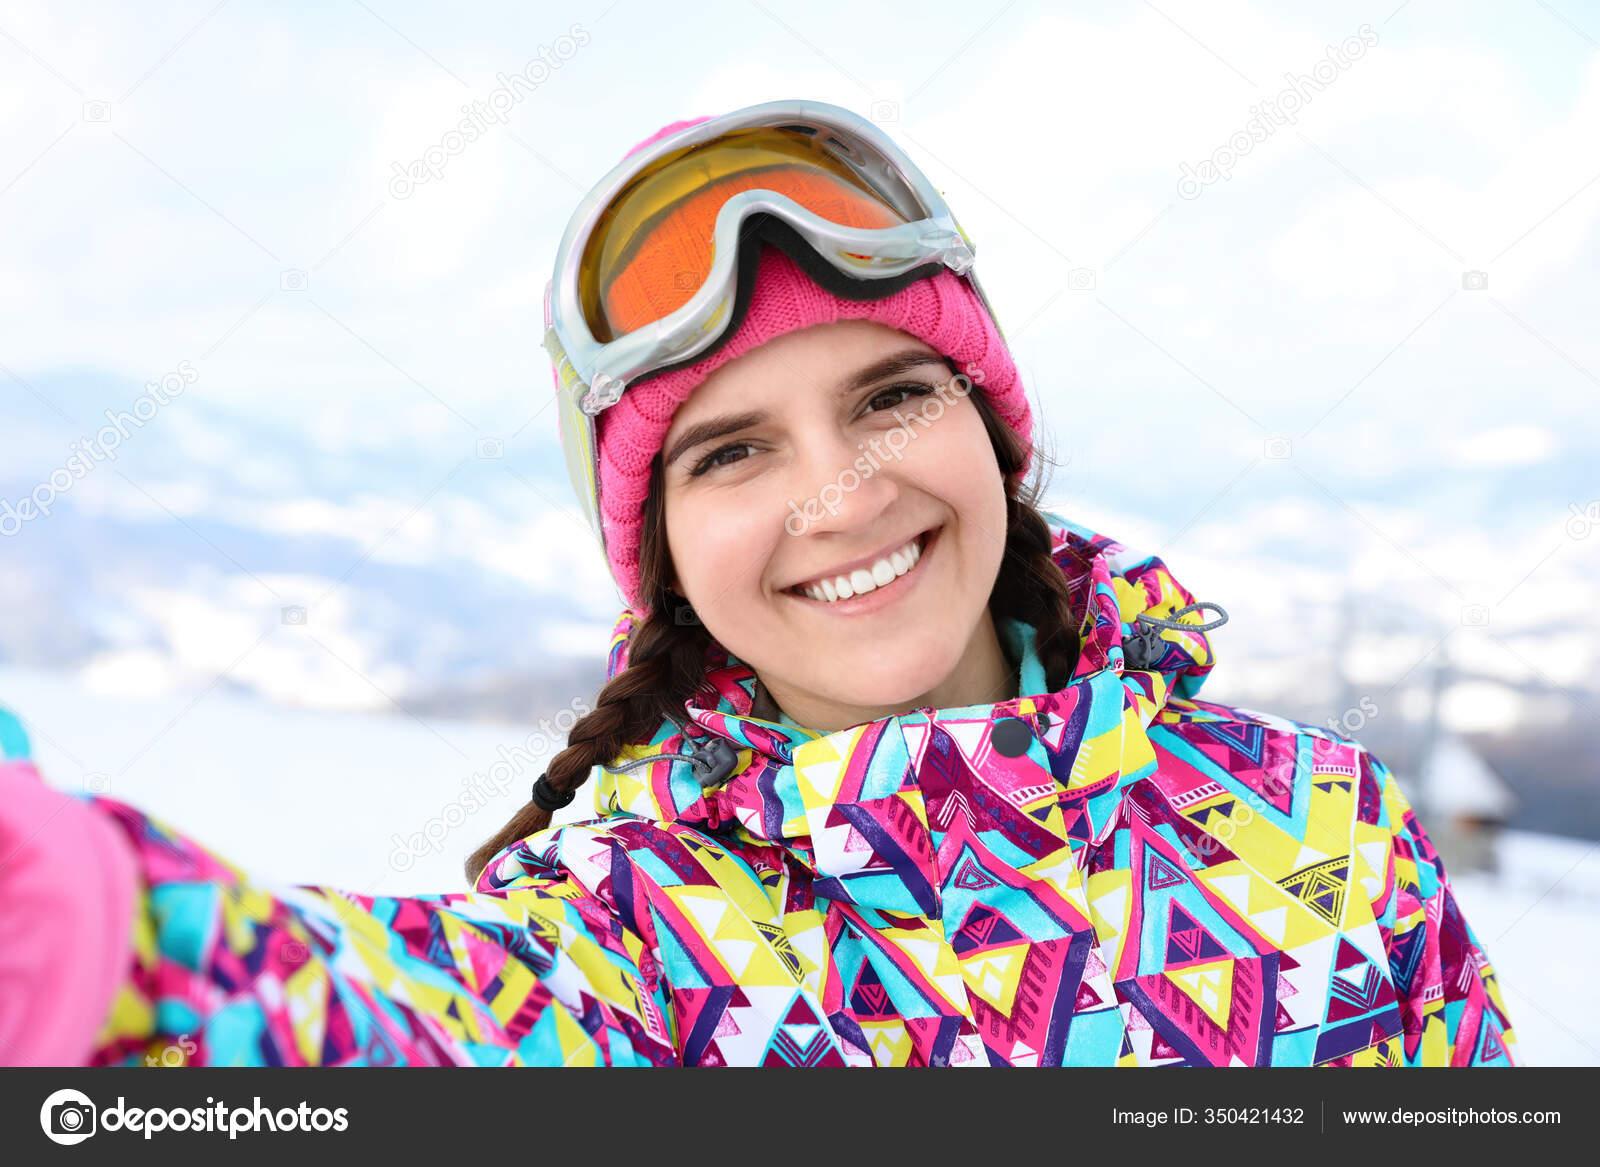 Junge Frau Macht Selfie Bergresort Winterurlaub